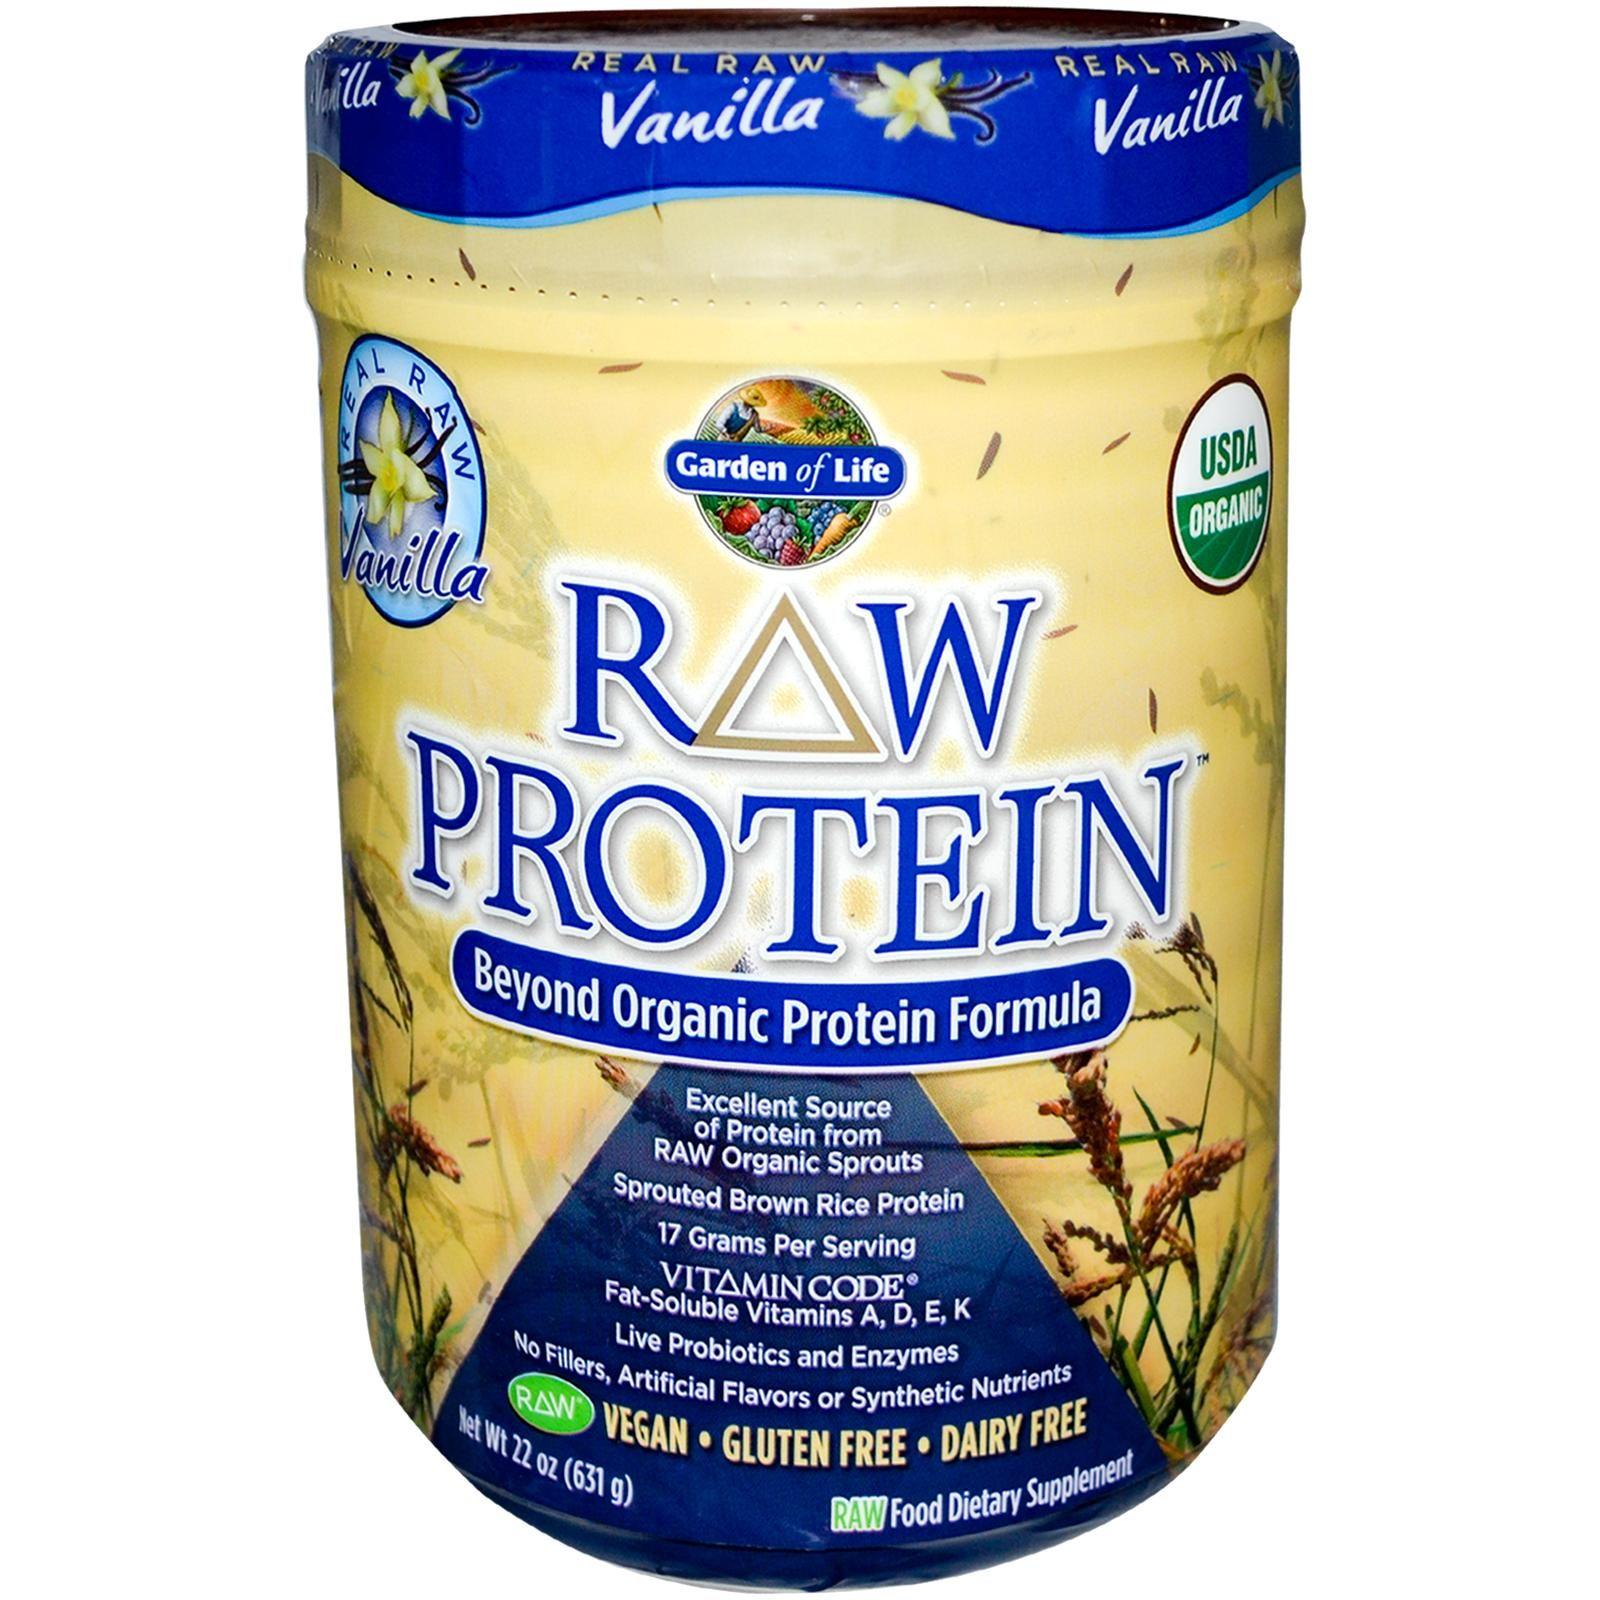 Garden of Life, RAW Organic Protein, Organic Plant Formula